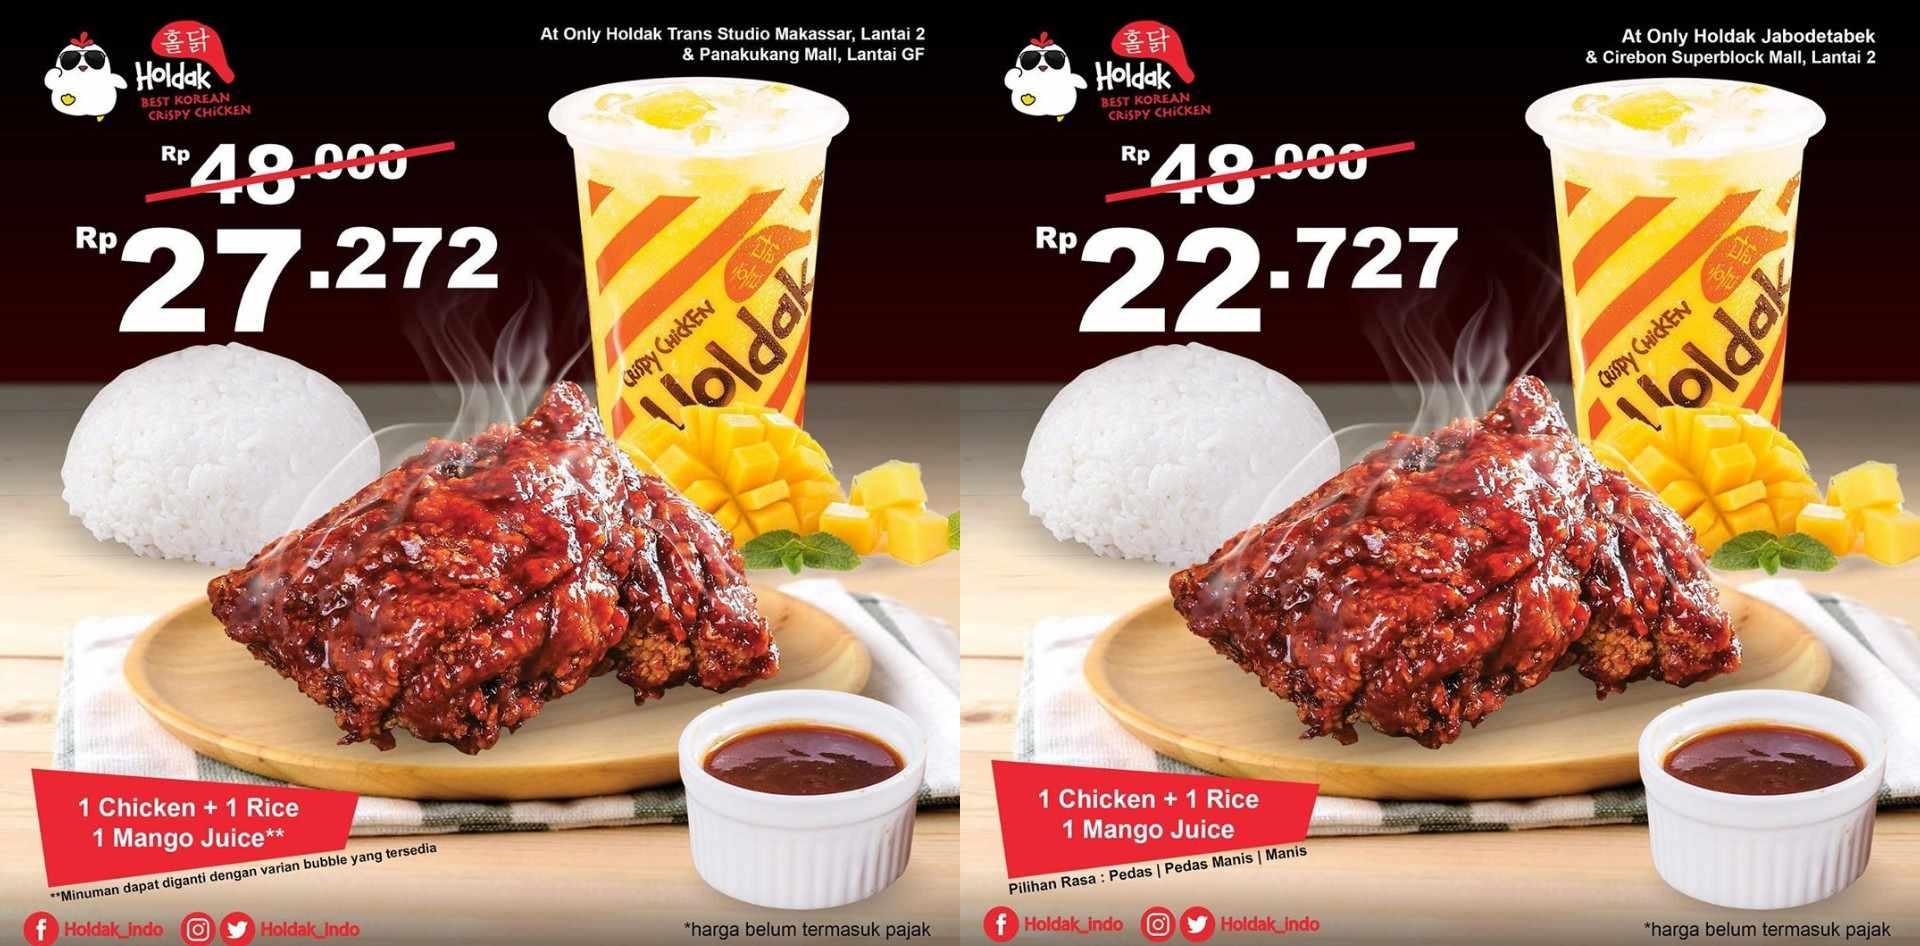 Diskon HOLDAK Crispy Chicken Promo mulai Rp.22.727